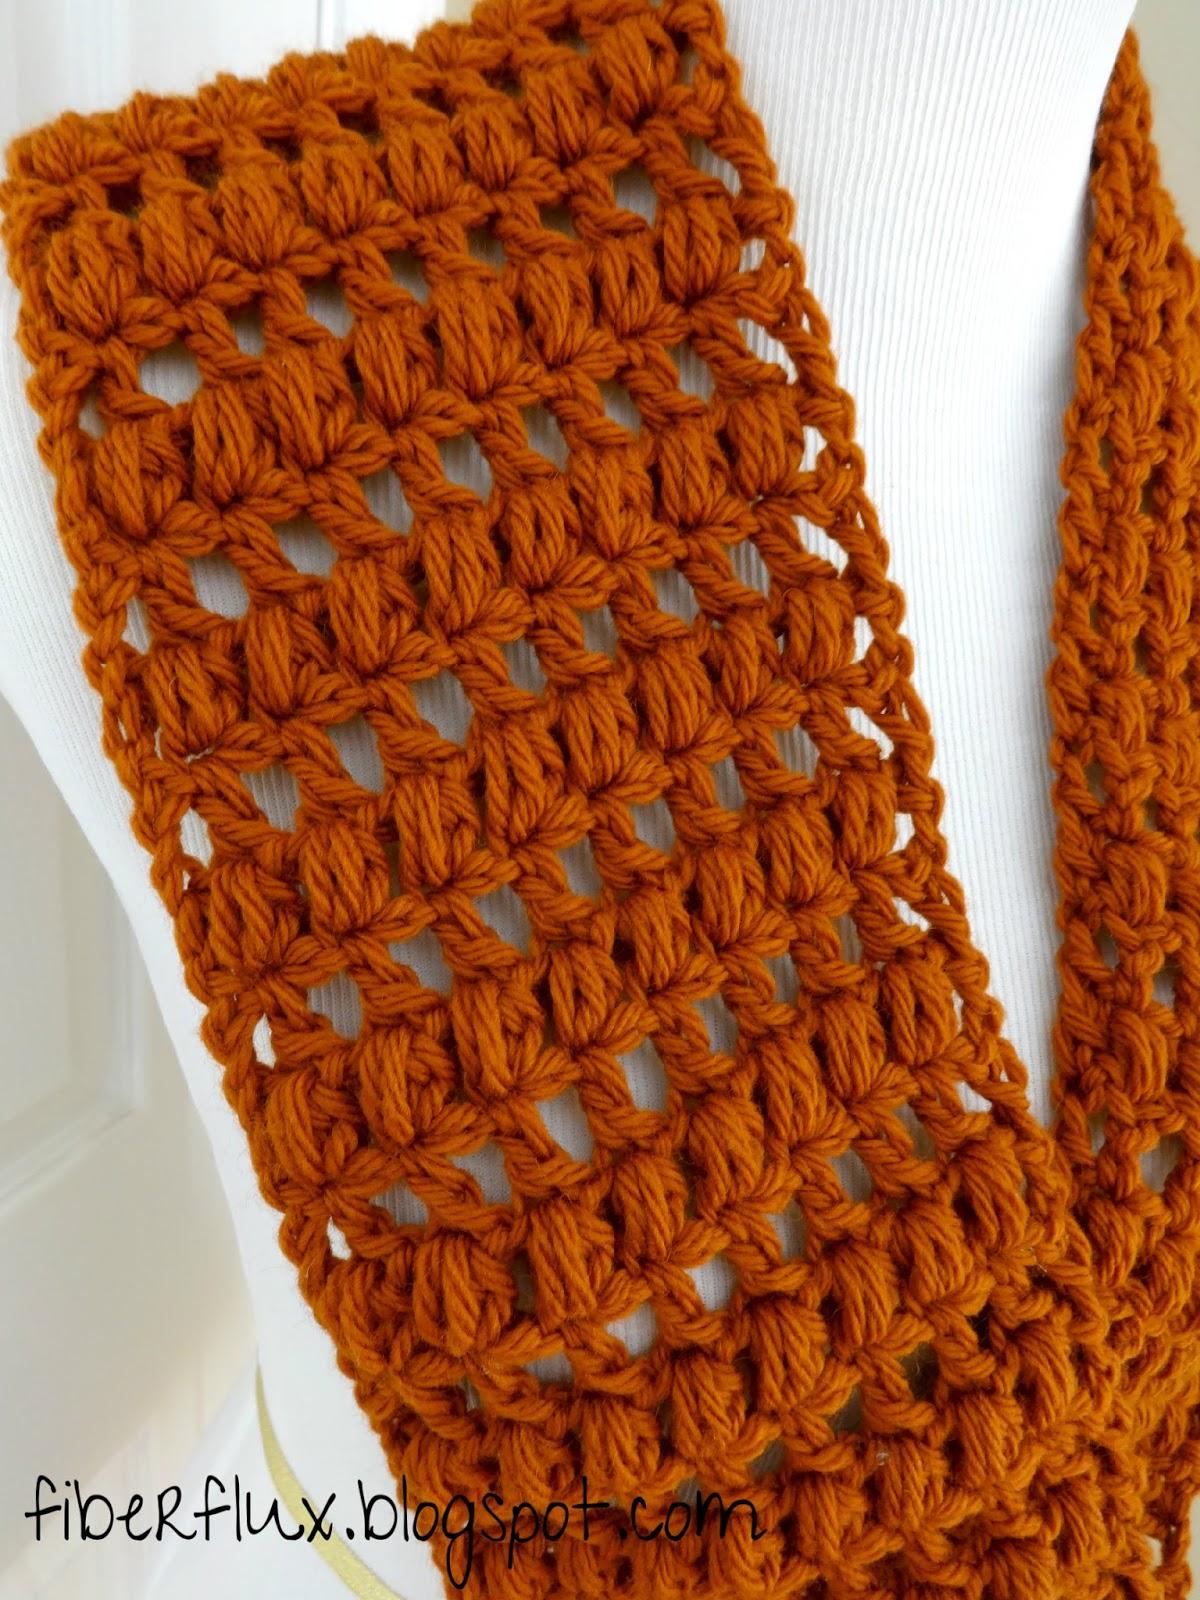 Fiber flux free crochet patternnger snap infinity scarf free crochet patternnger snap infinity scarf bankloansurffo Choice Image